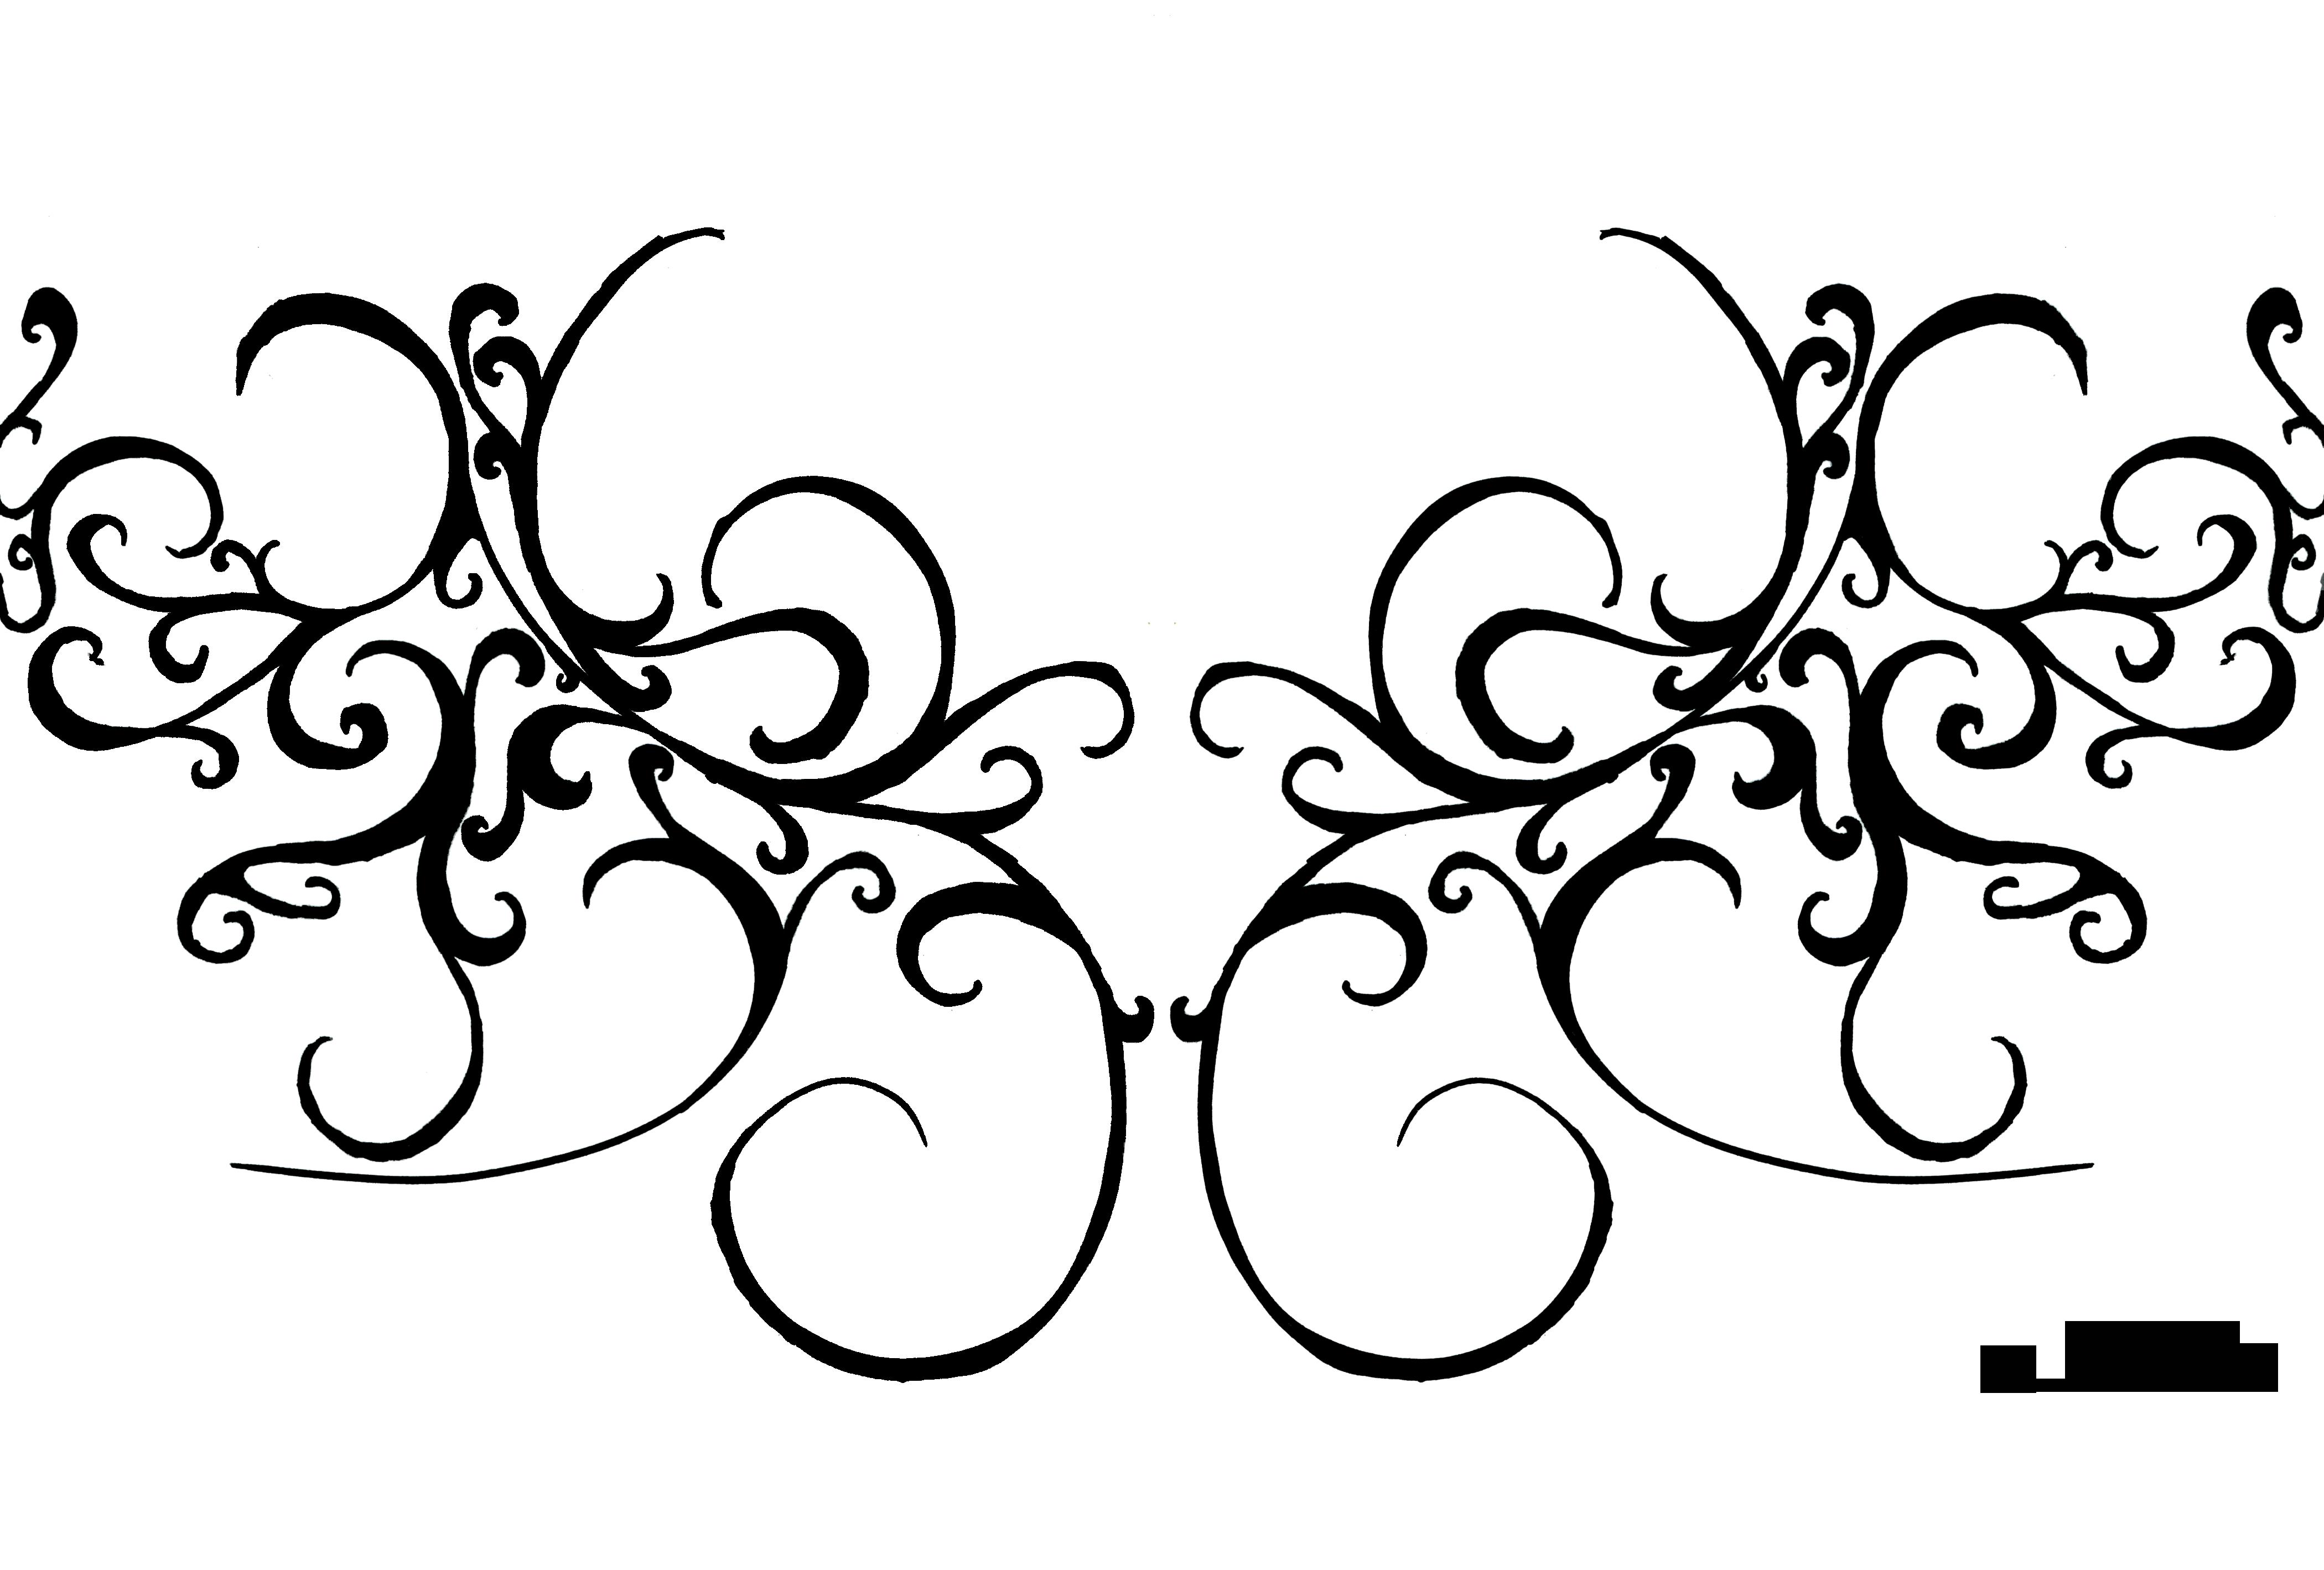 Swirl Line Design Clipart : Old swirl six double wings by misosoup on deviantart